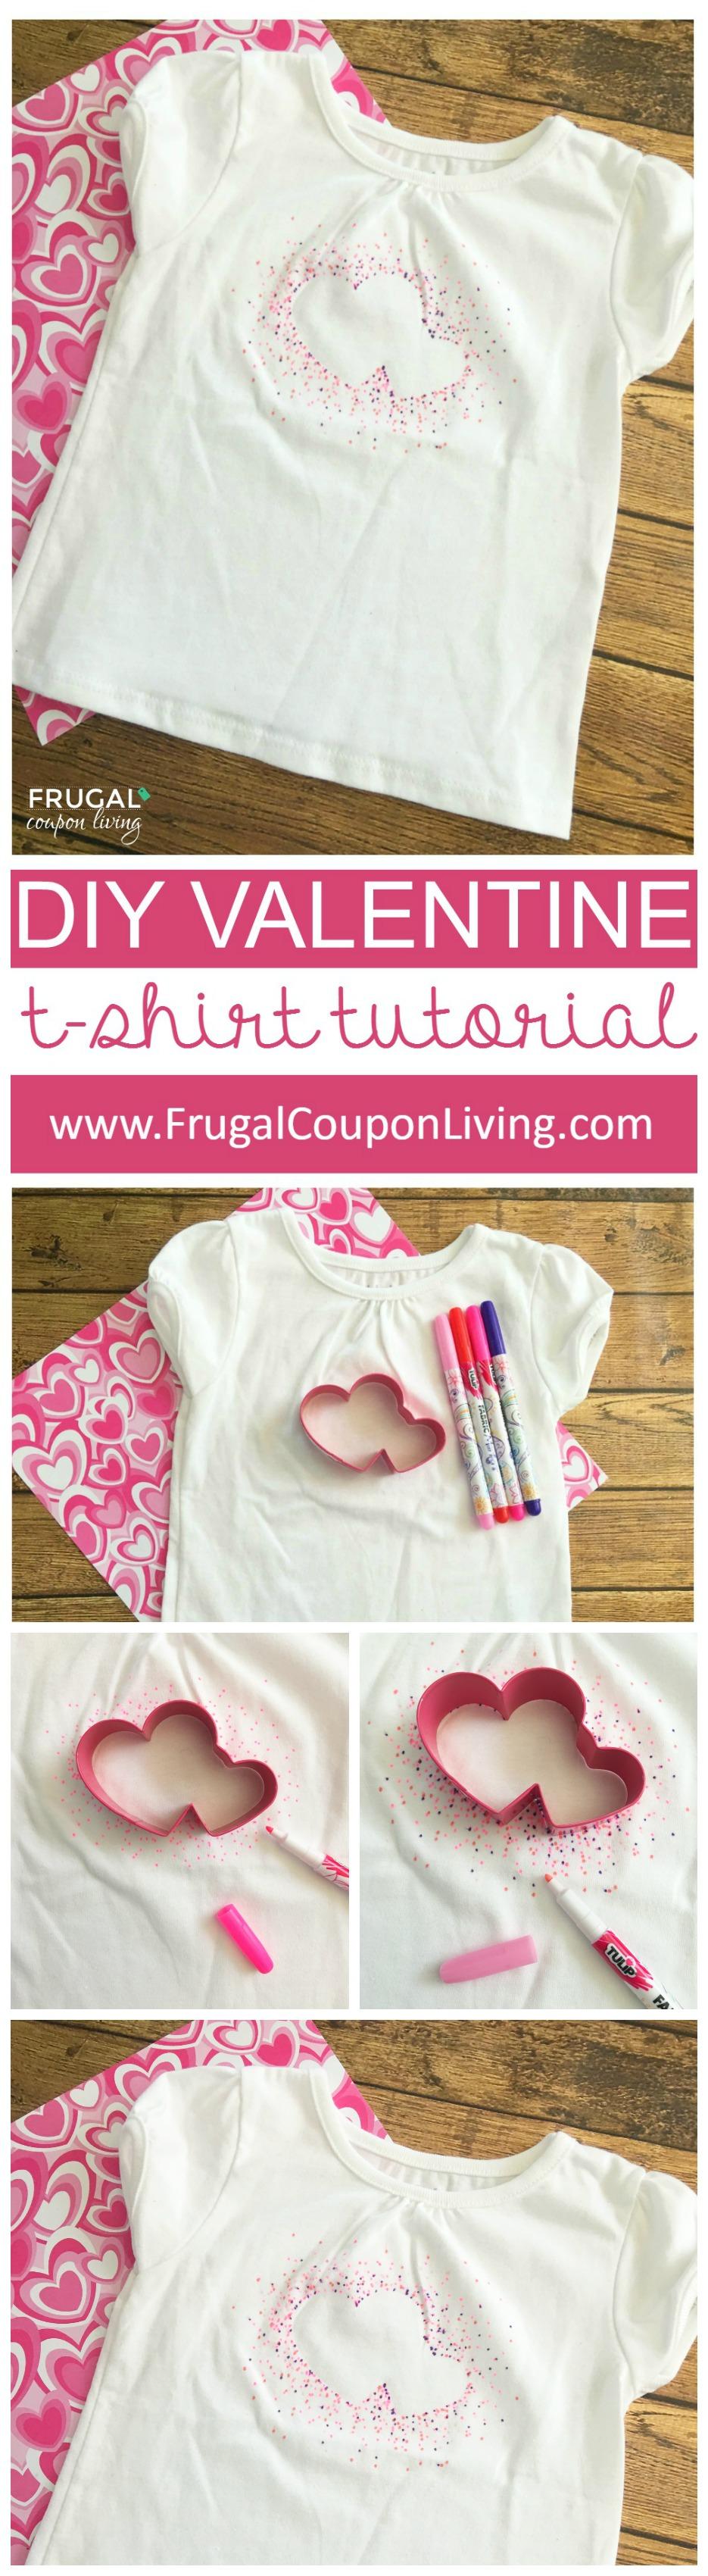 DIY-Valentine-Shirt-long-Collage-frugal-coupon-living